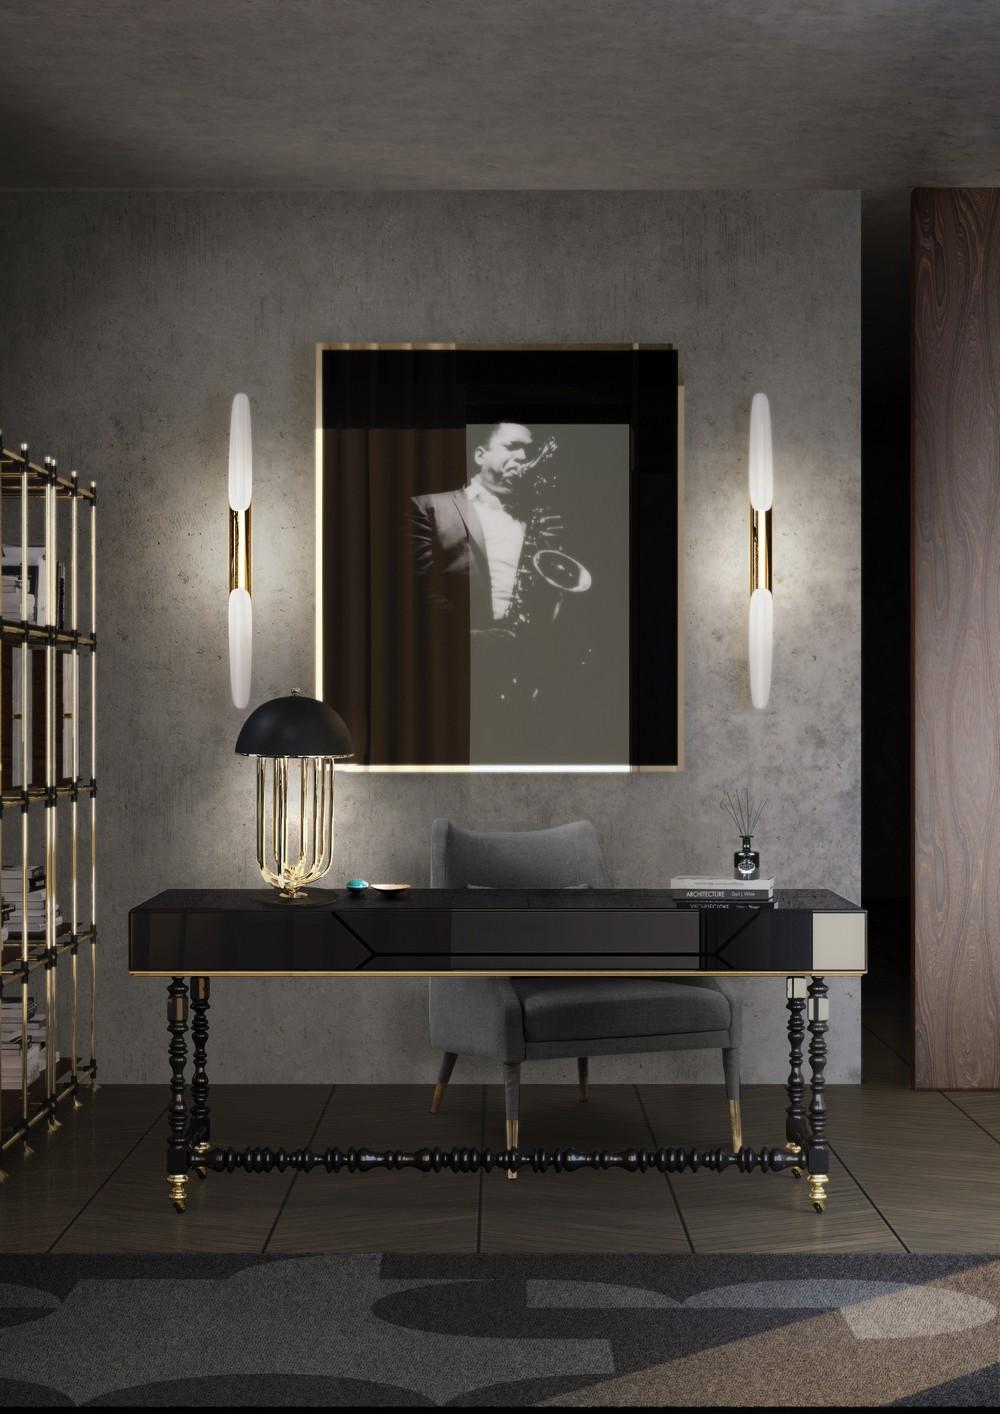 luxury desks Top 25 Luxury Desks to Modernize Your Home Office Decor Top 25 Luxury Desks to Modernize Your Home Office Decor 5